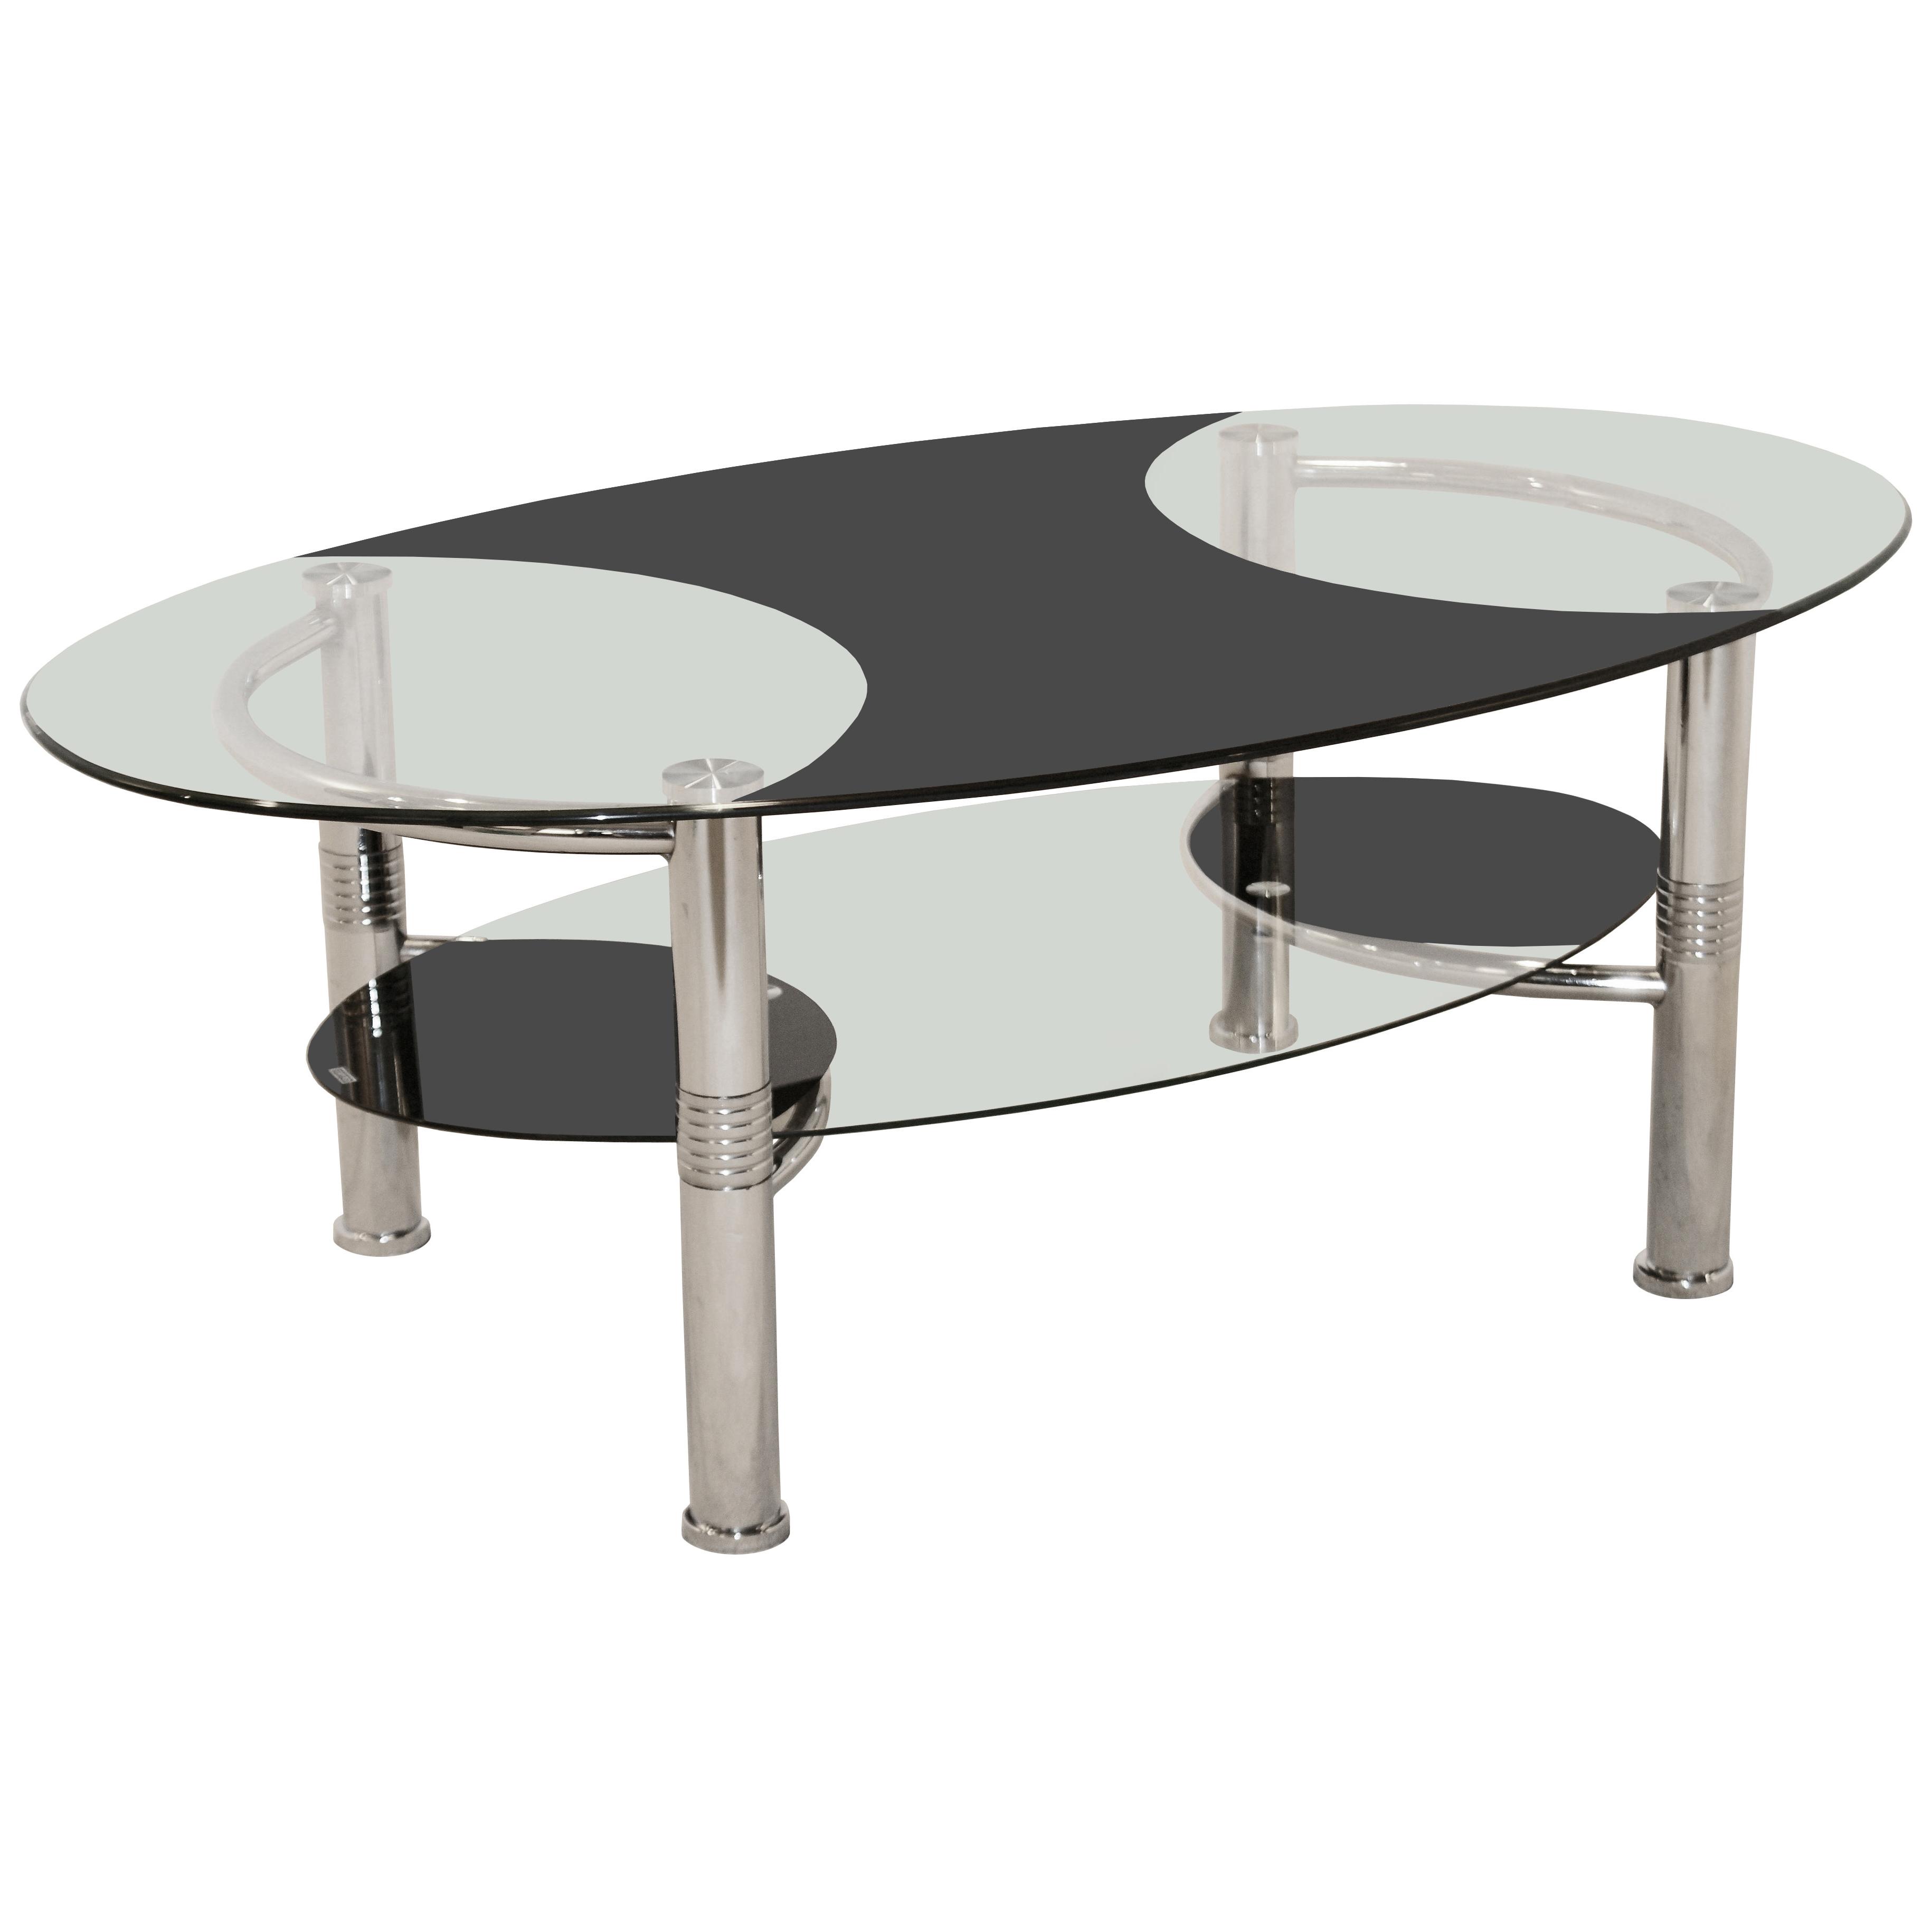 Chrome Metal & Glass Oval Coffee Table with Shelf